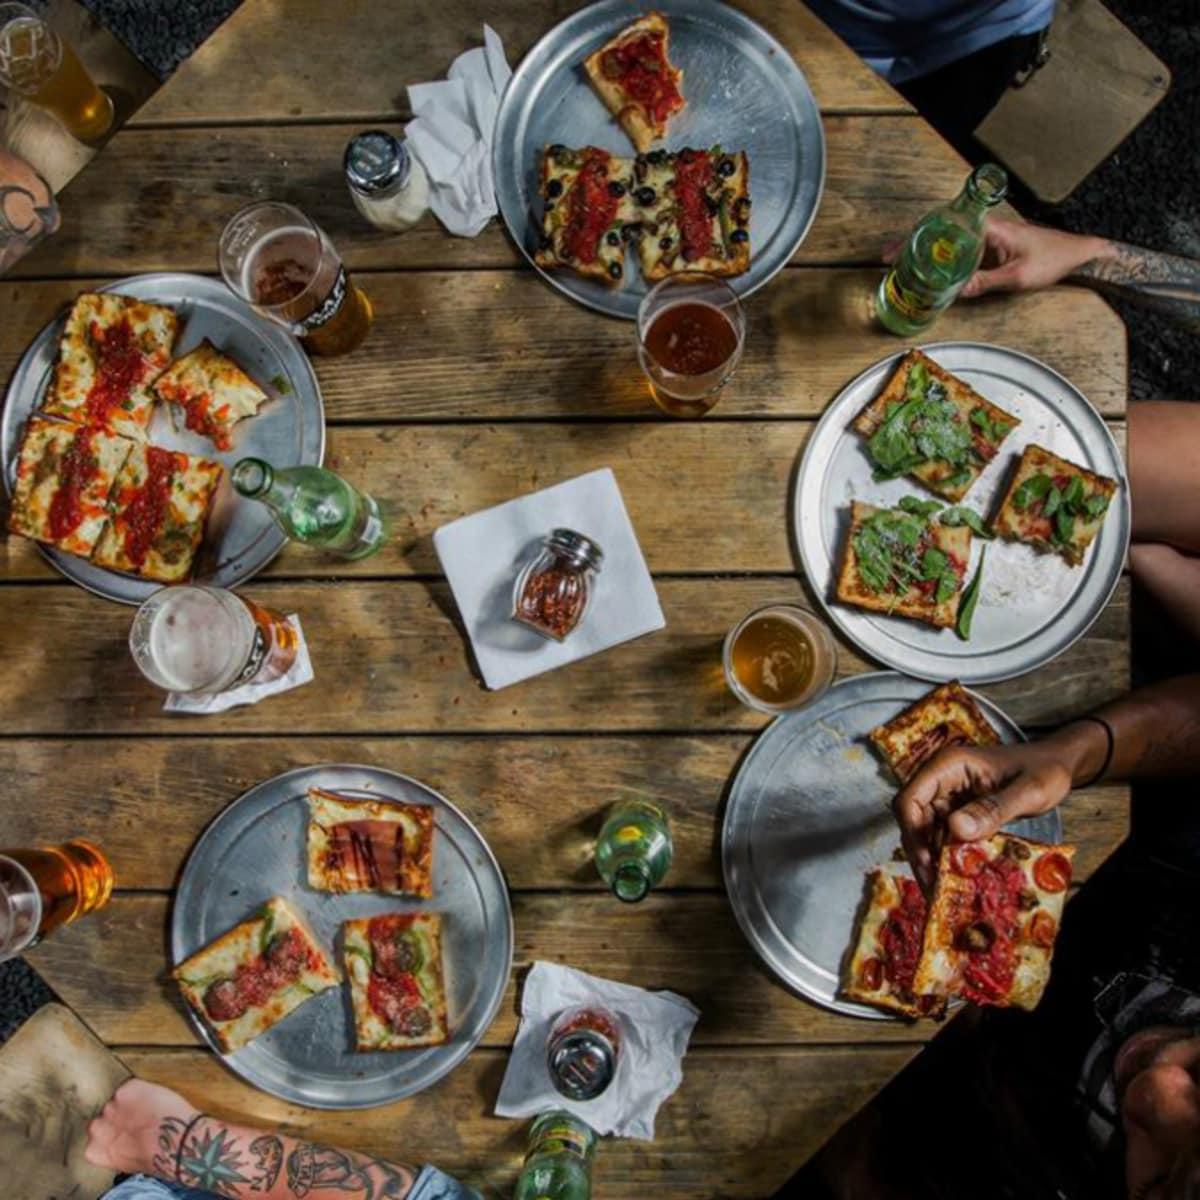 Via 313_Detroit style pizza_Austin food trailer_aerial view_2014